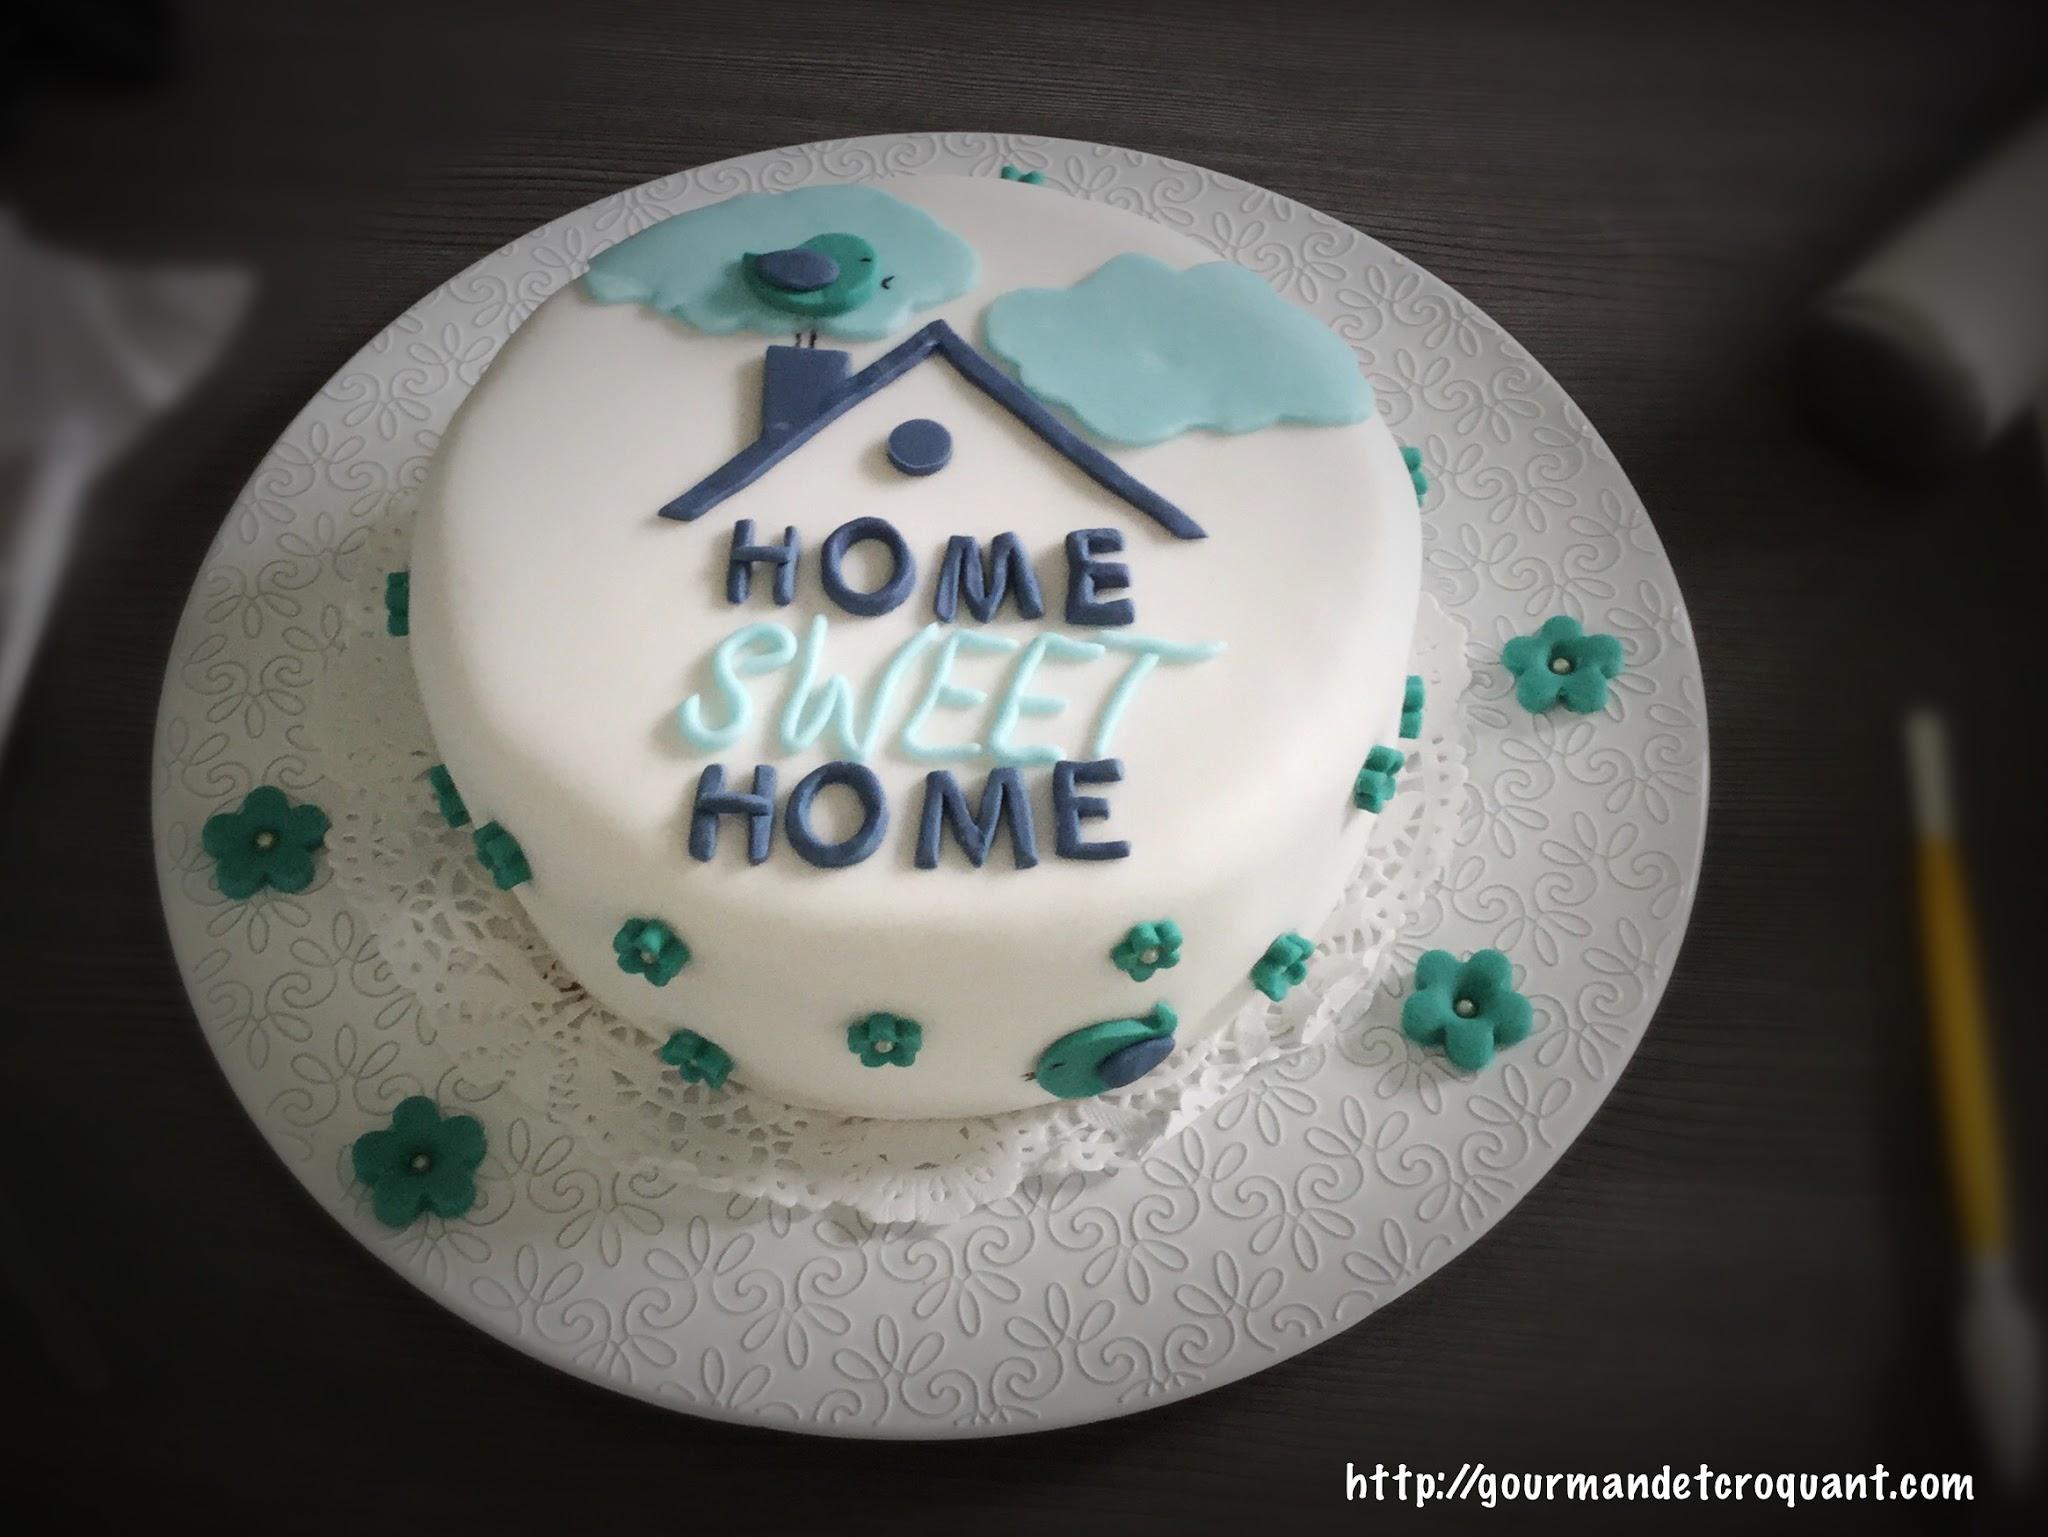 Gourmand et croquant cake design home sweet home for Home sweet home designs